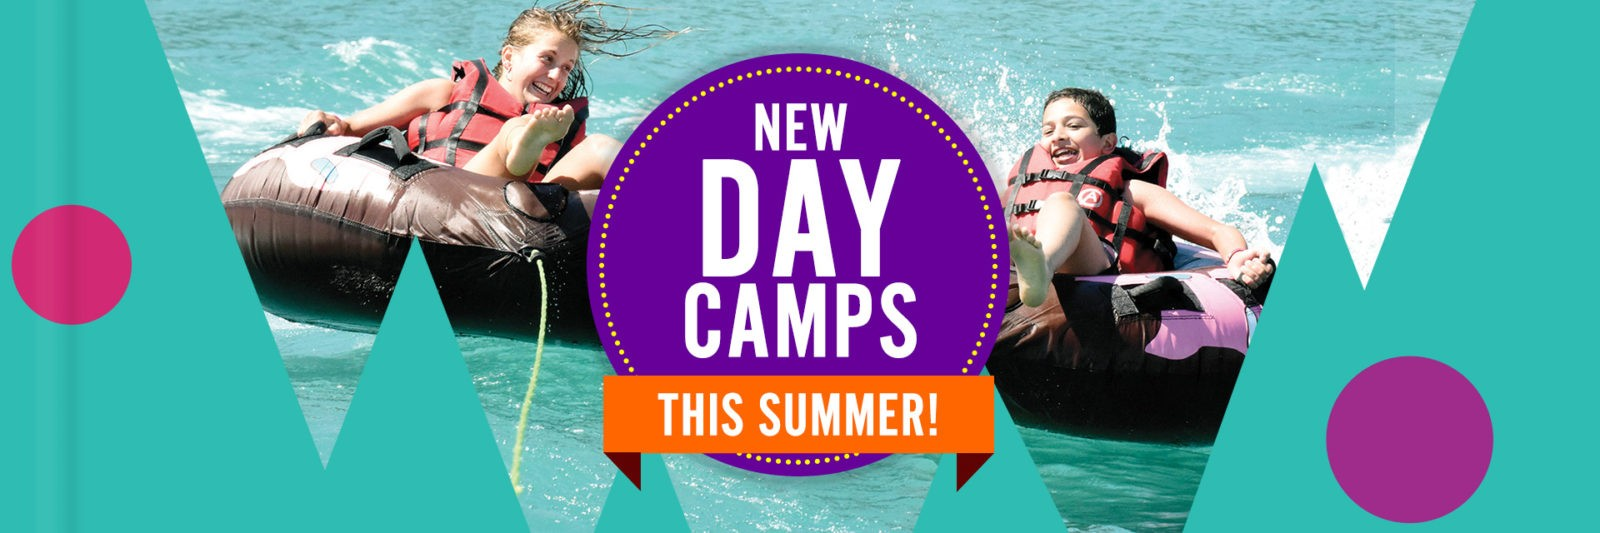 New Summer Day Camps in Verbier, Switzerland